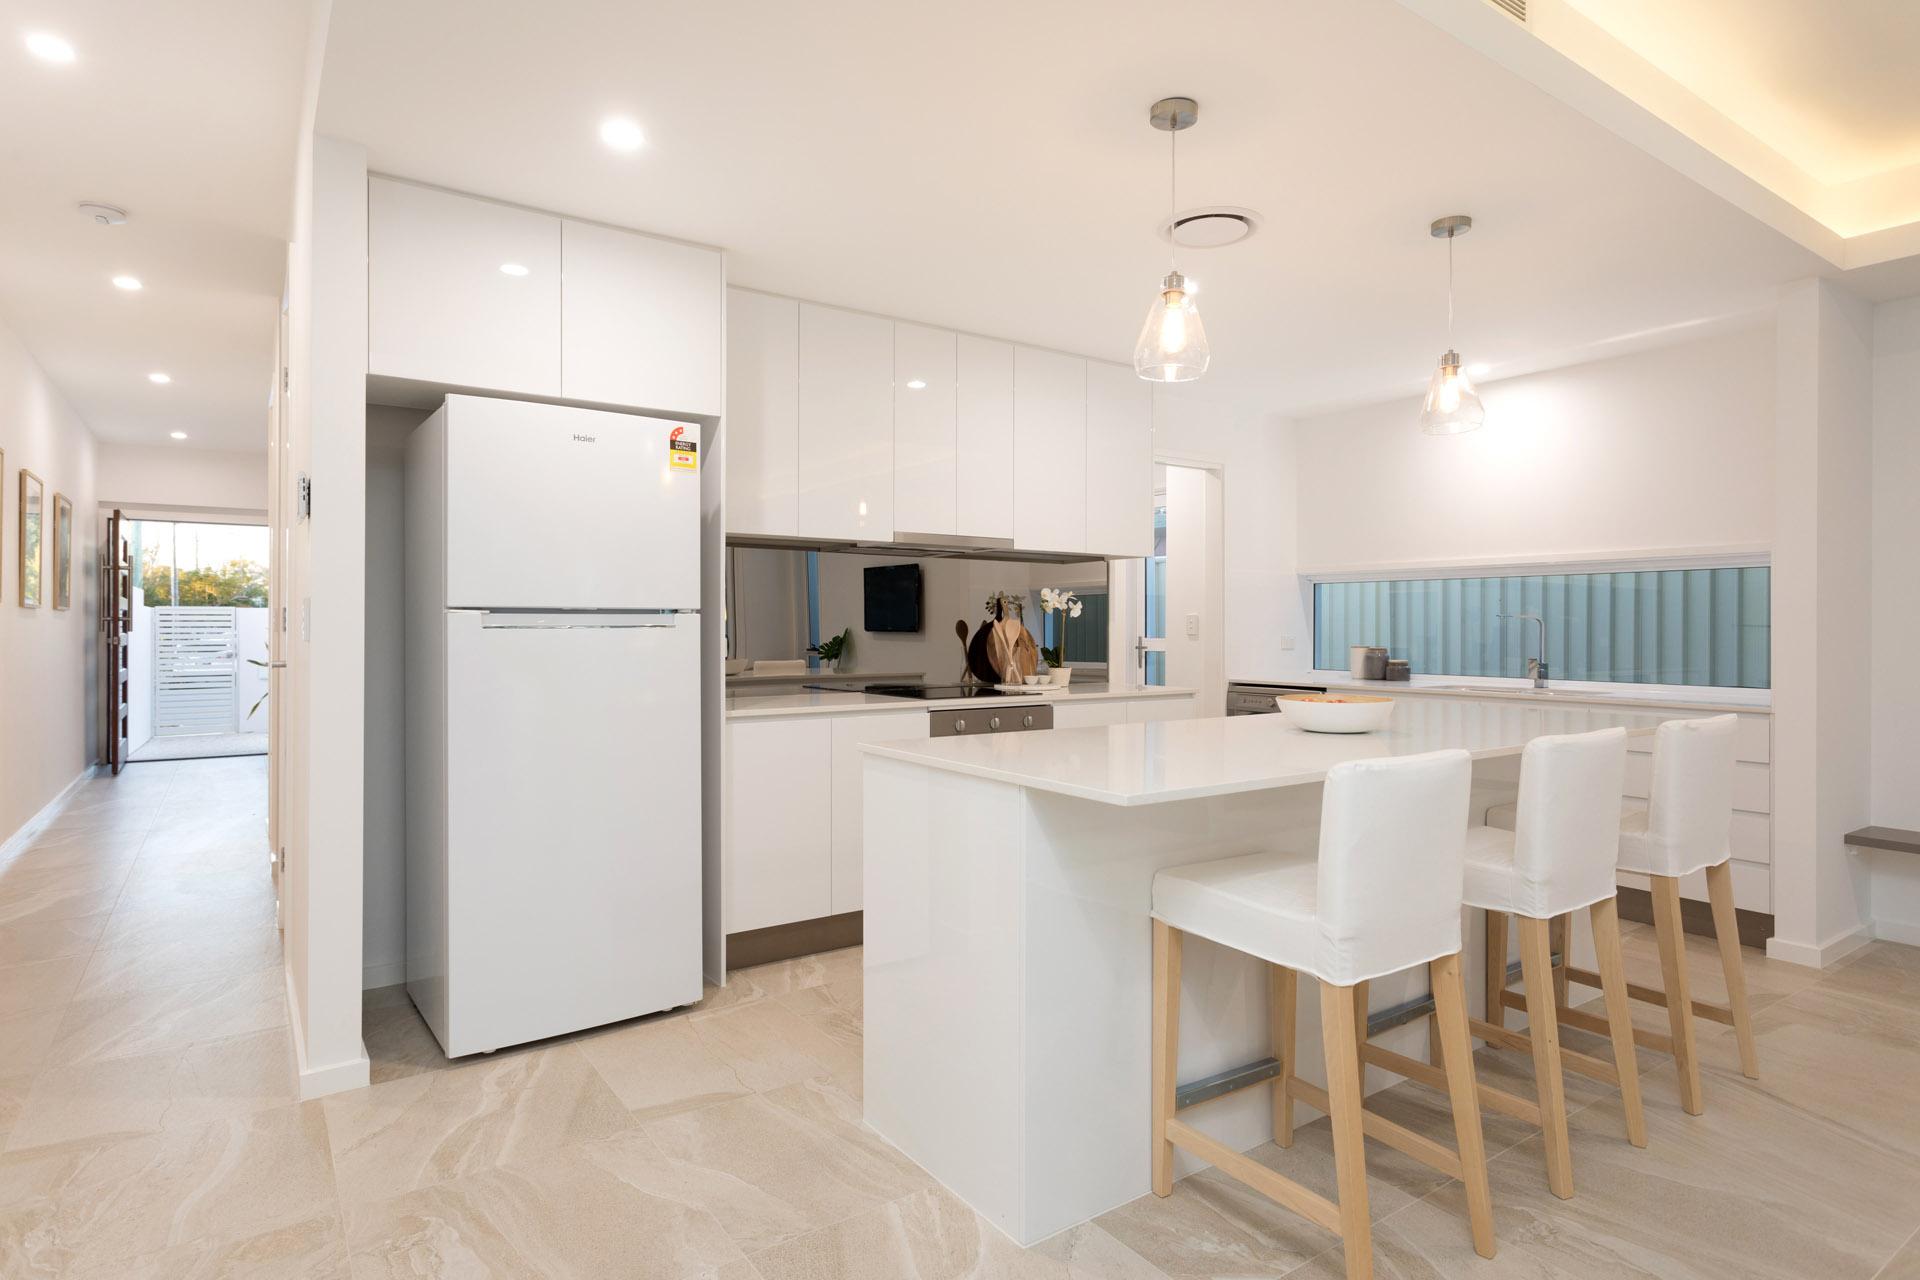 Real Estate | Gold Coast | Chevron Realty | 20180822 0b4a7040